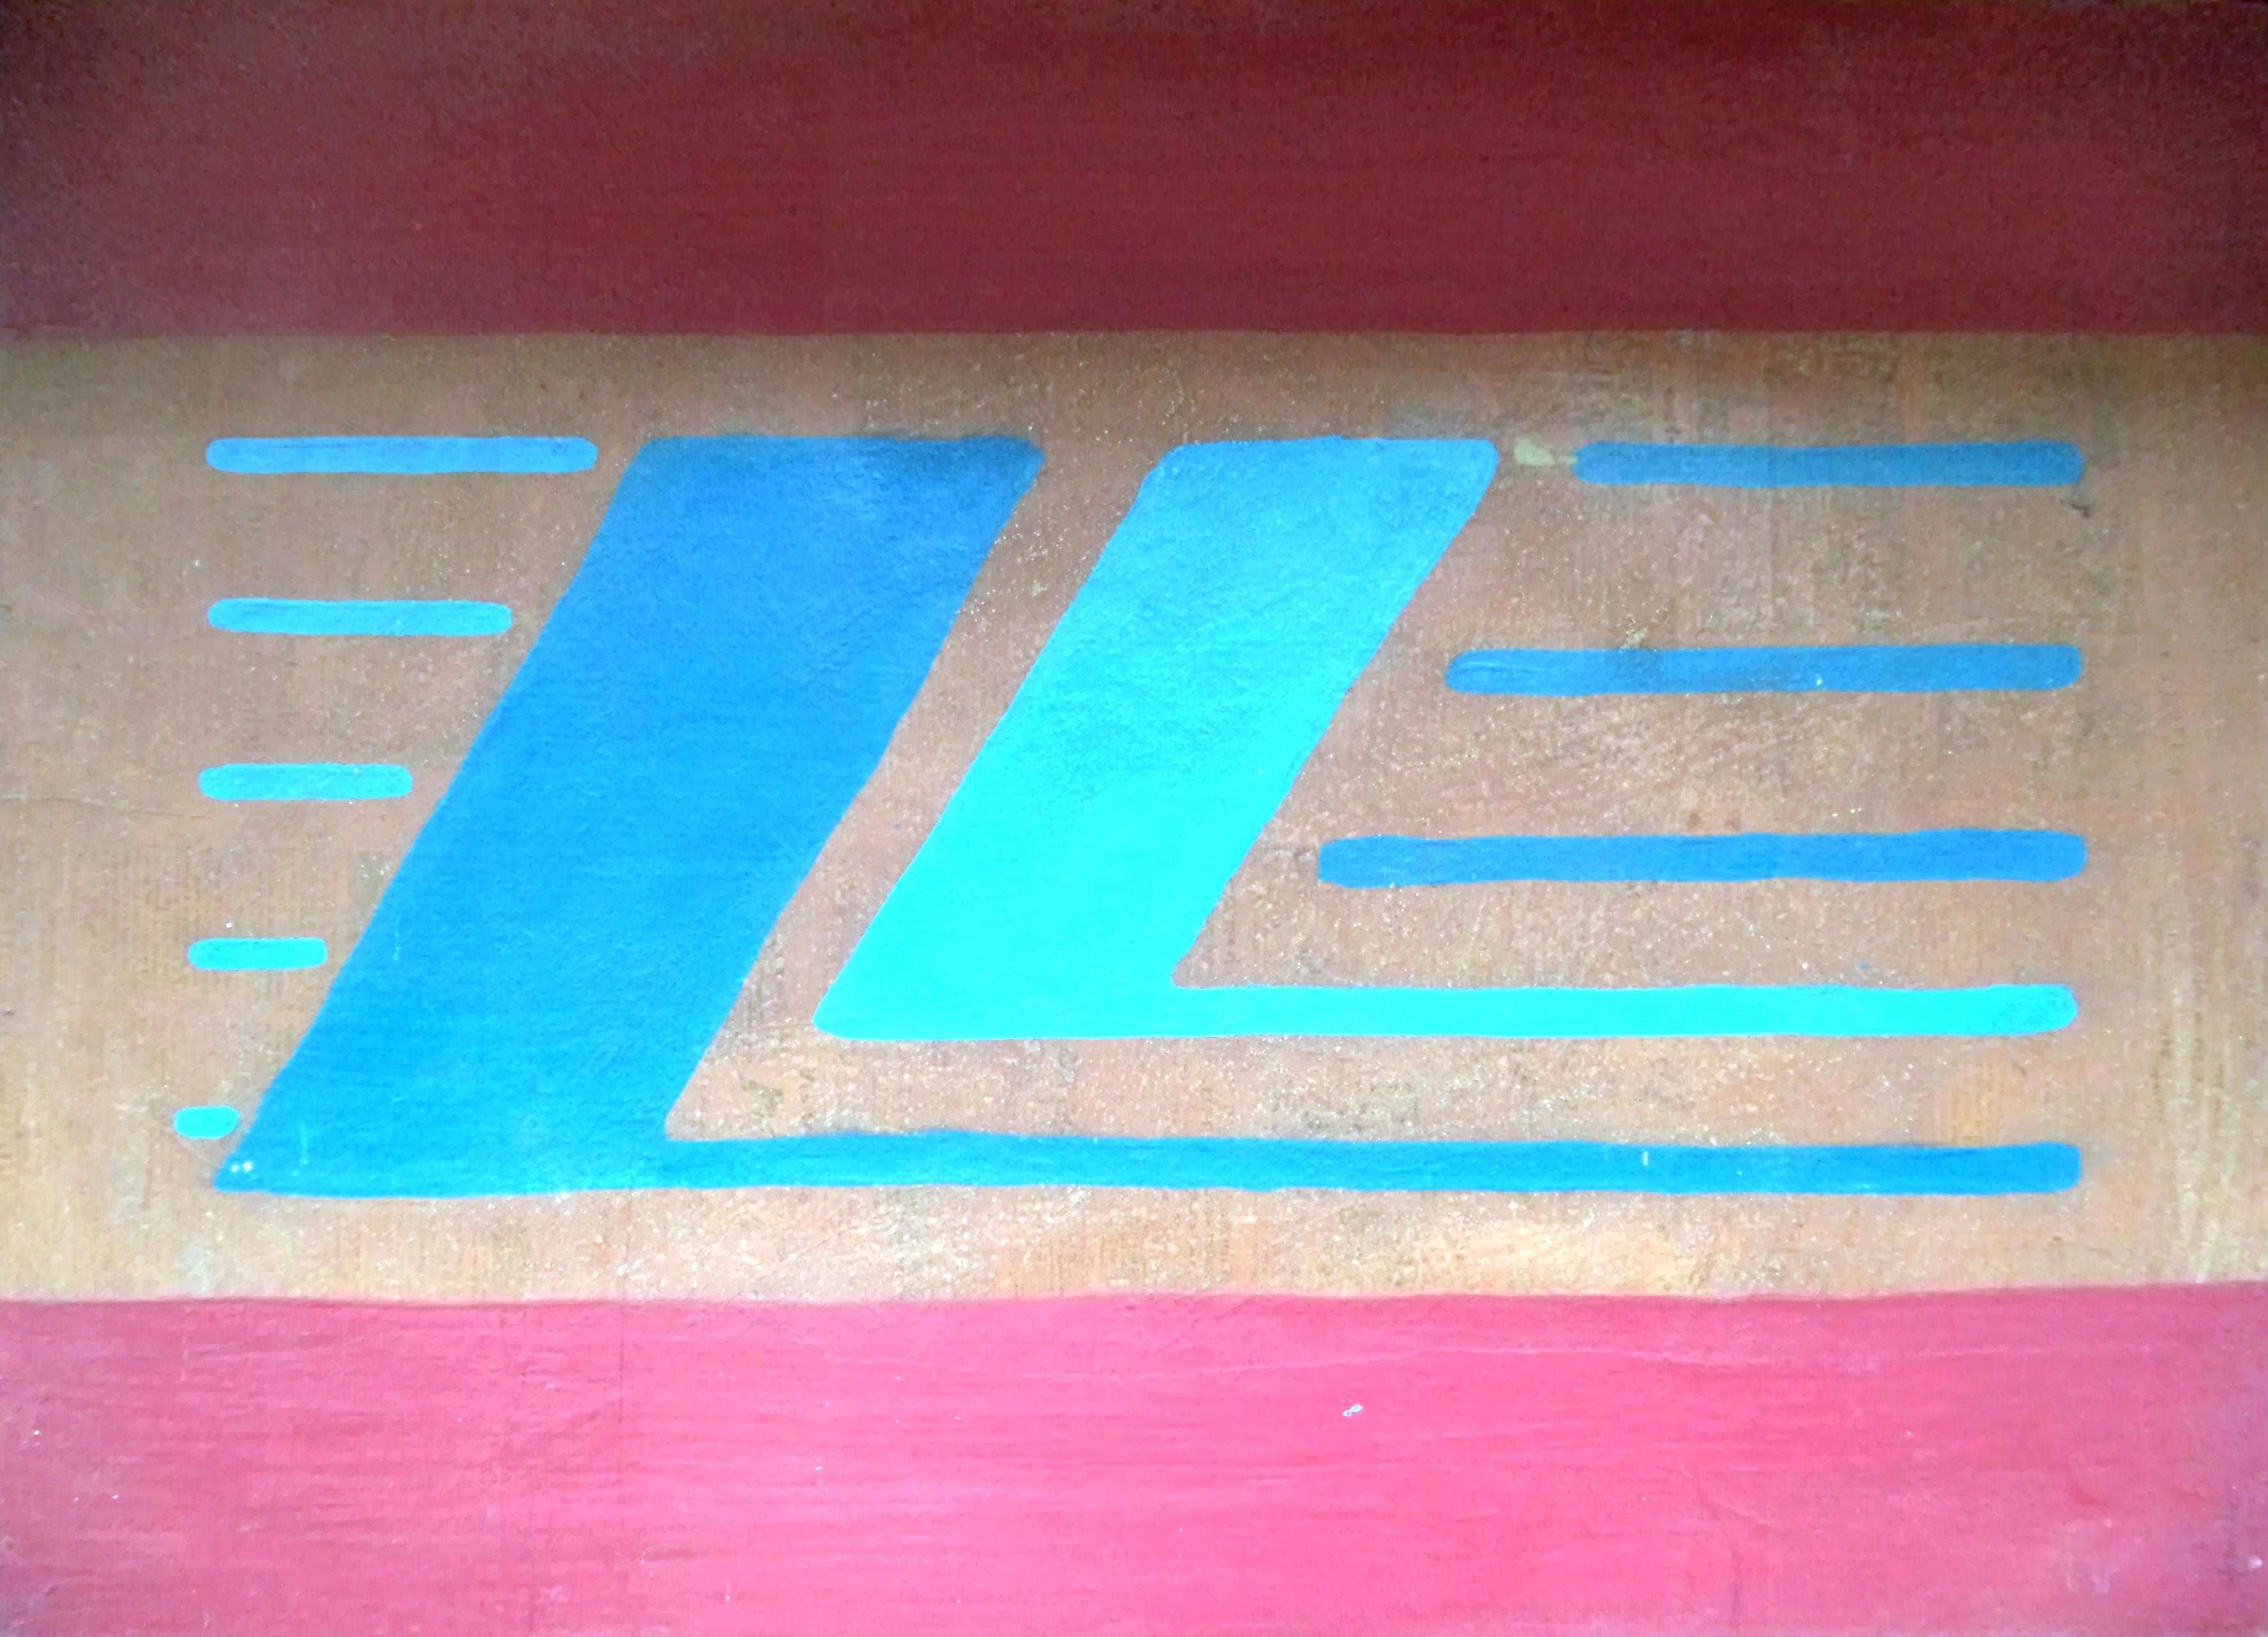 Marcone_Moreira_-_Grafismo_abstrato,_2002._Acrílica_s_eucatex,_61x85cm.